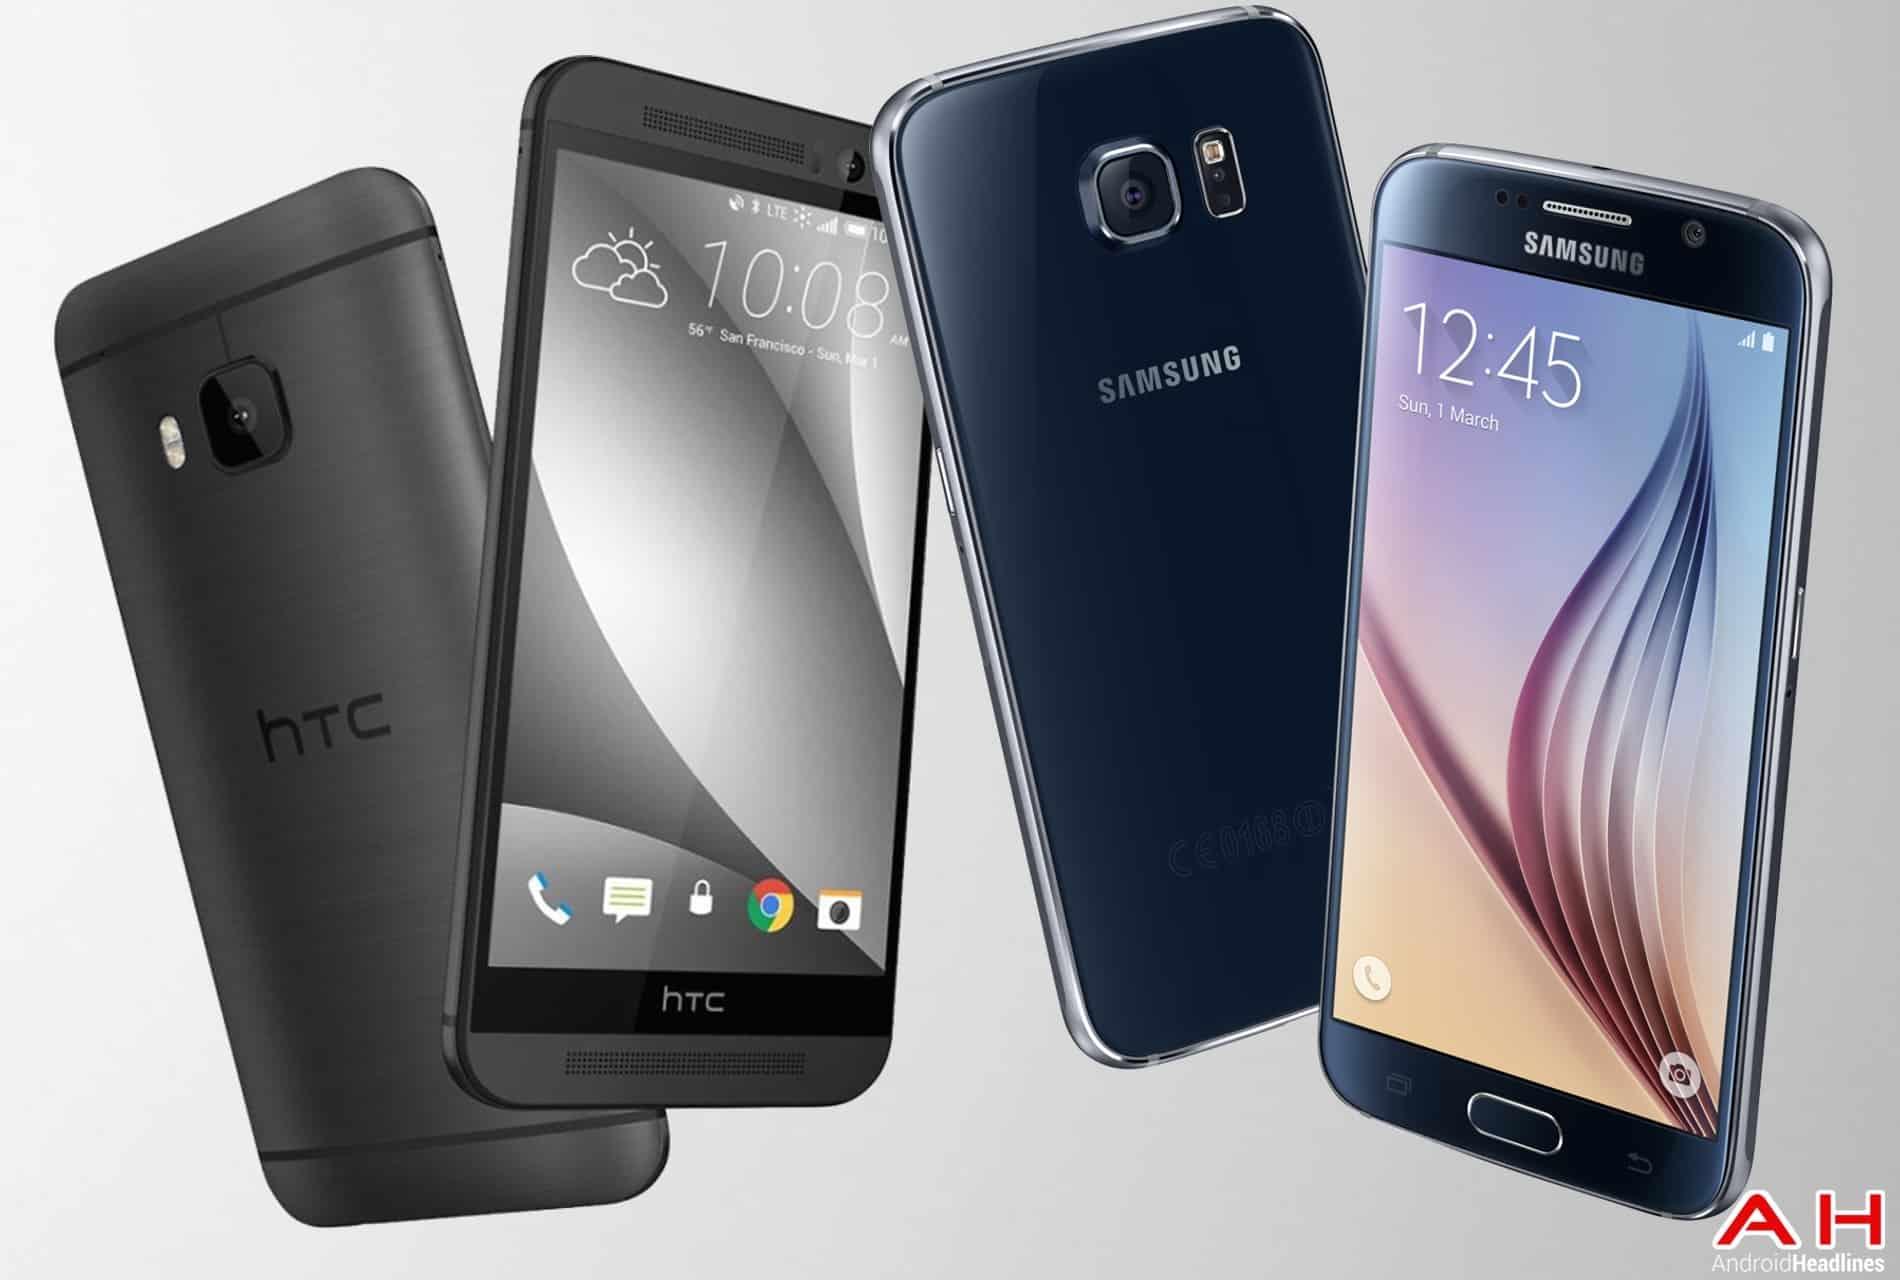 AH HTC ONE m9 vs Samsung Galaxy S6